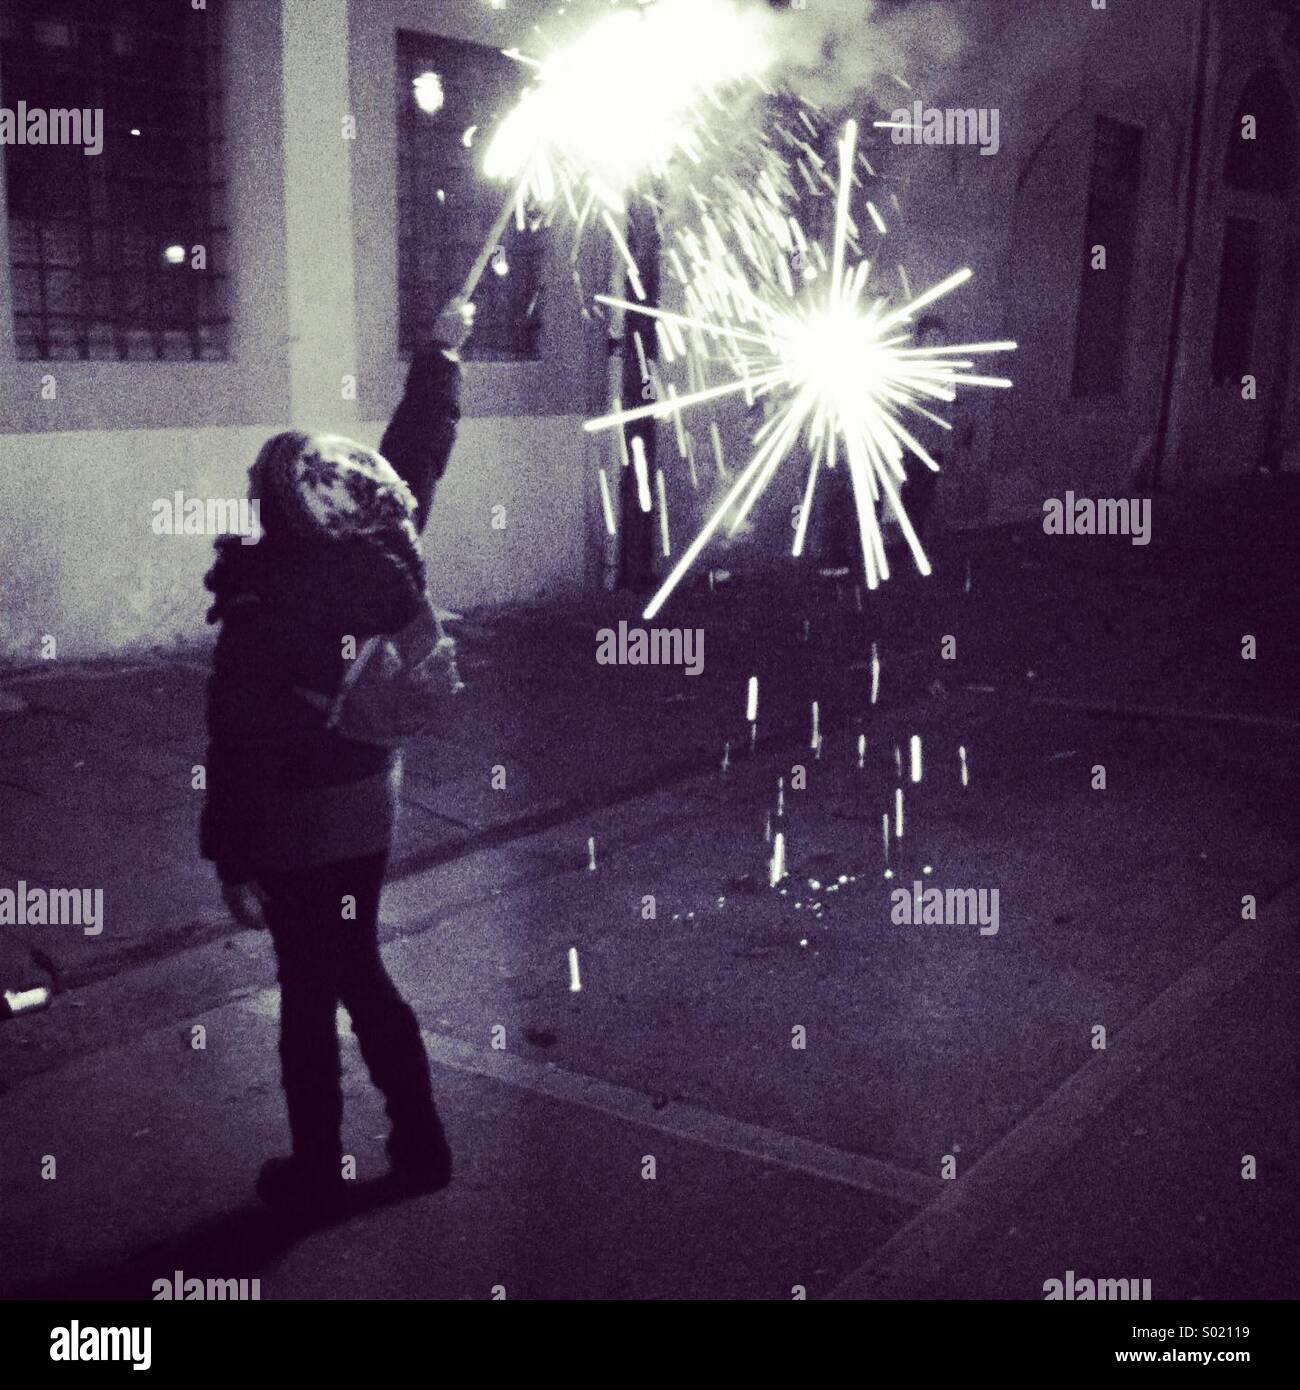 Happy new year! - Stock Image